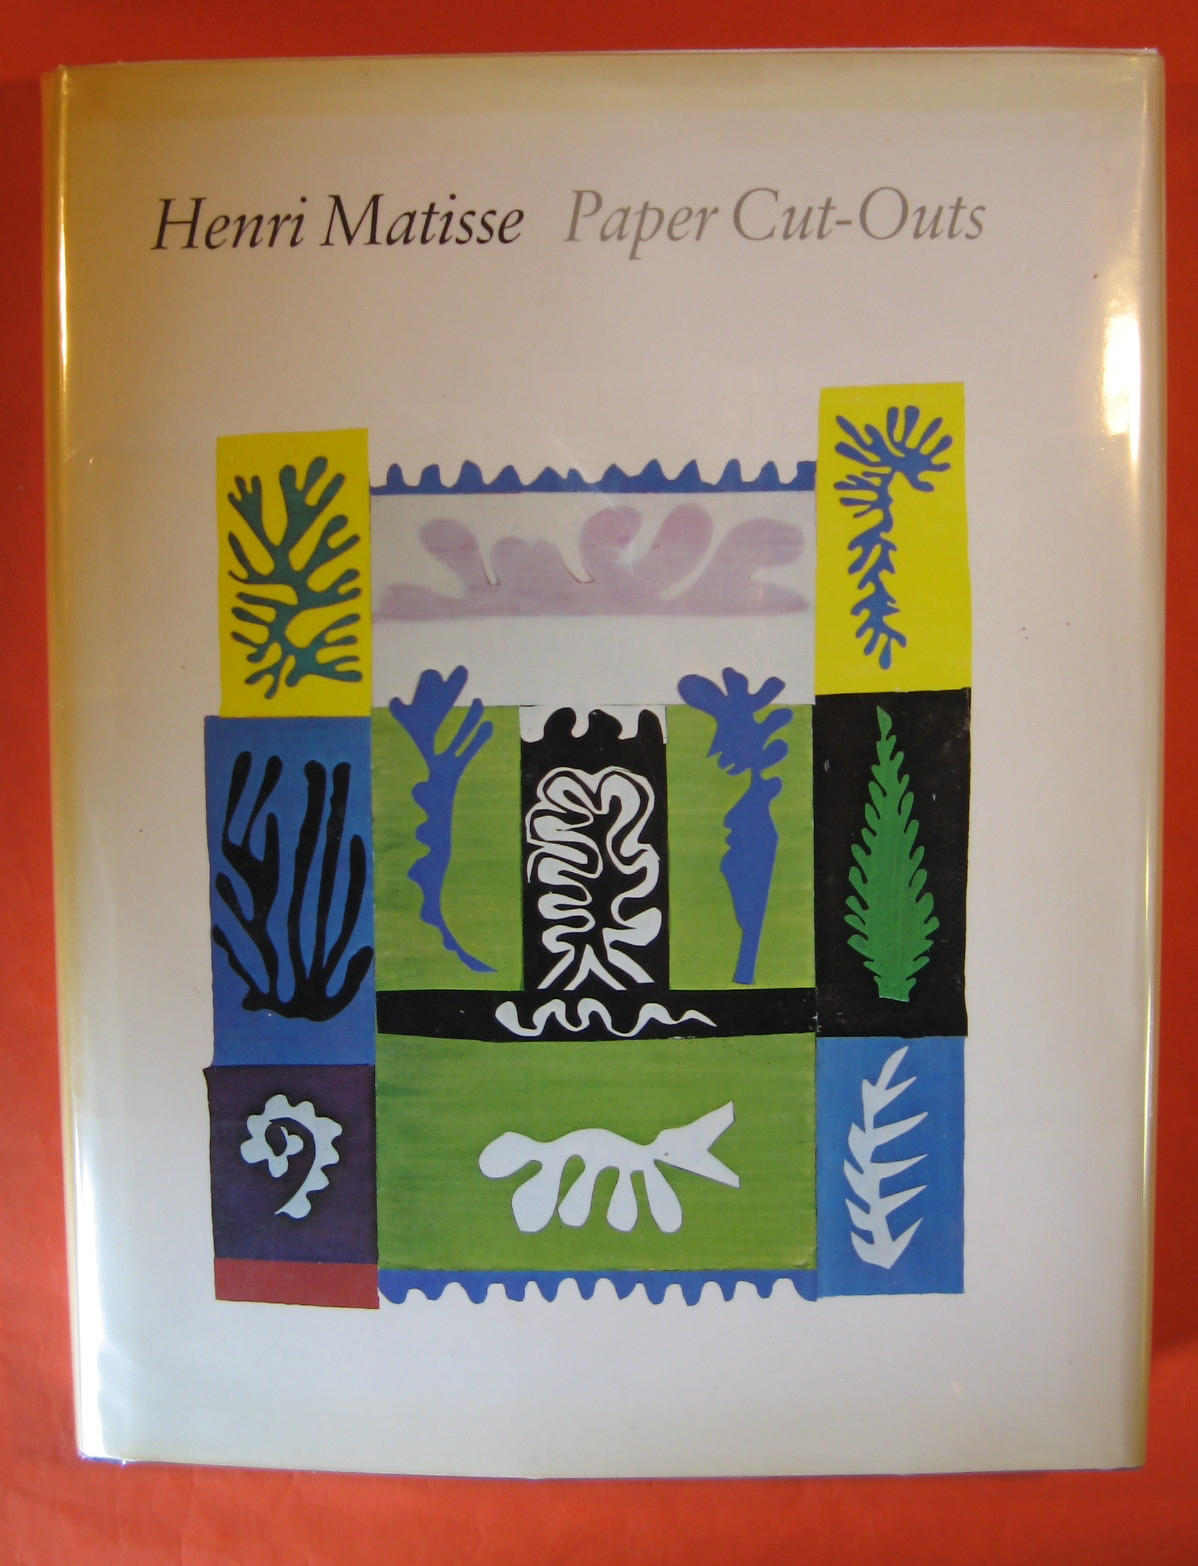 Henri Matisse : Paper Cut-Outs, Jack Cowart;Jack D. Flam;Dominique Fourcade;John Hallmark Neff;John Haletsky;Antoinette King